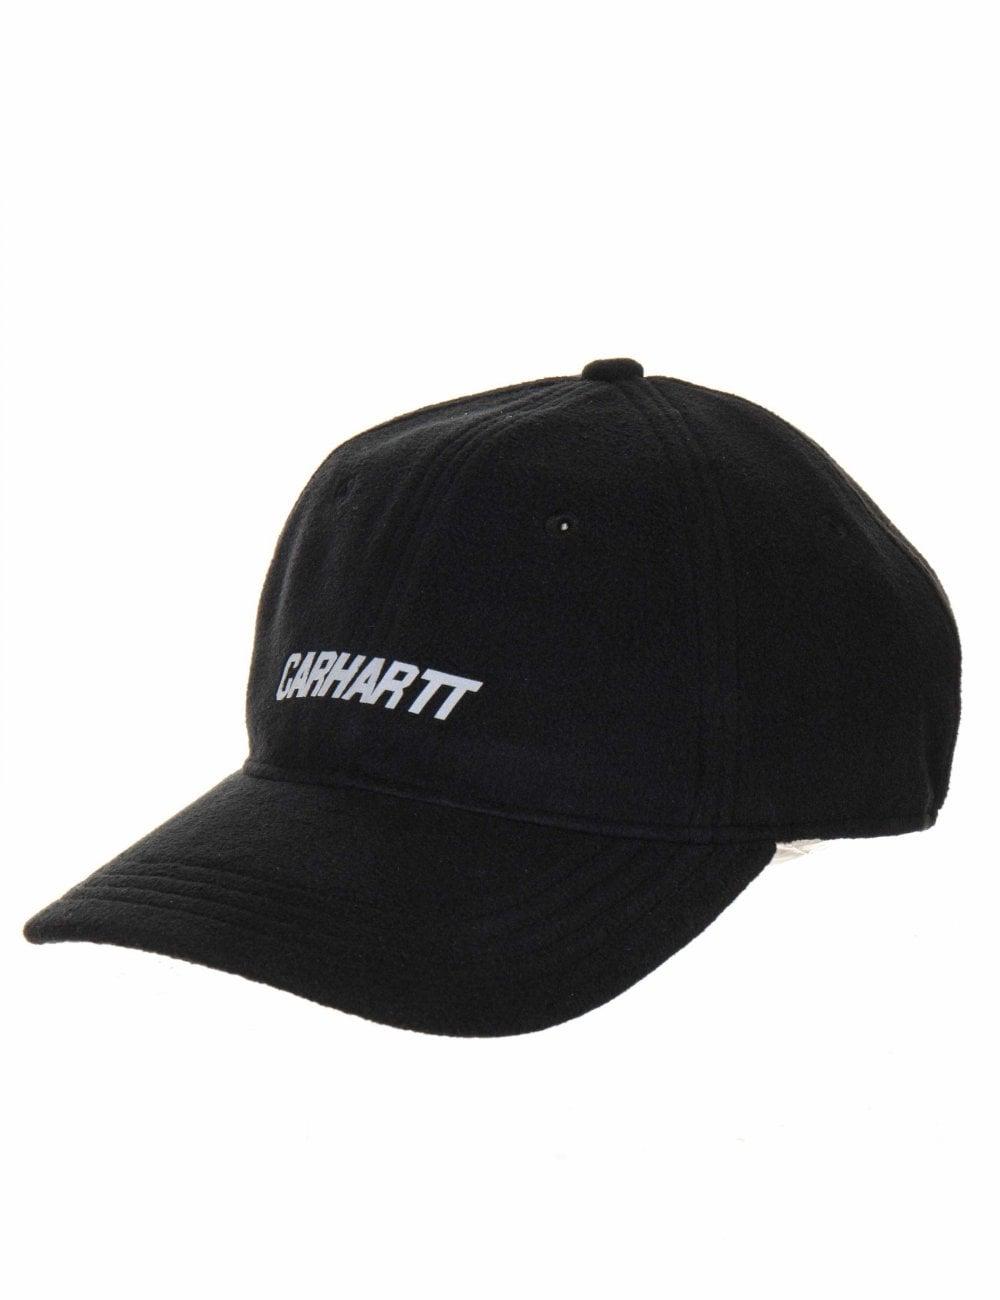 super popular amazing selection in stock Beaufort Cap - Black/Reflective